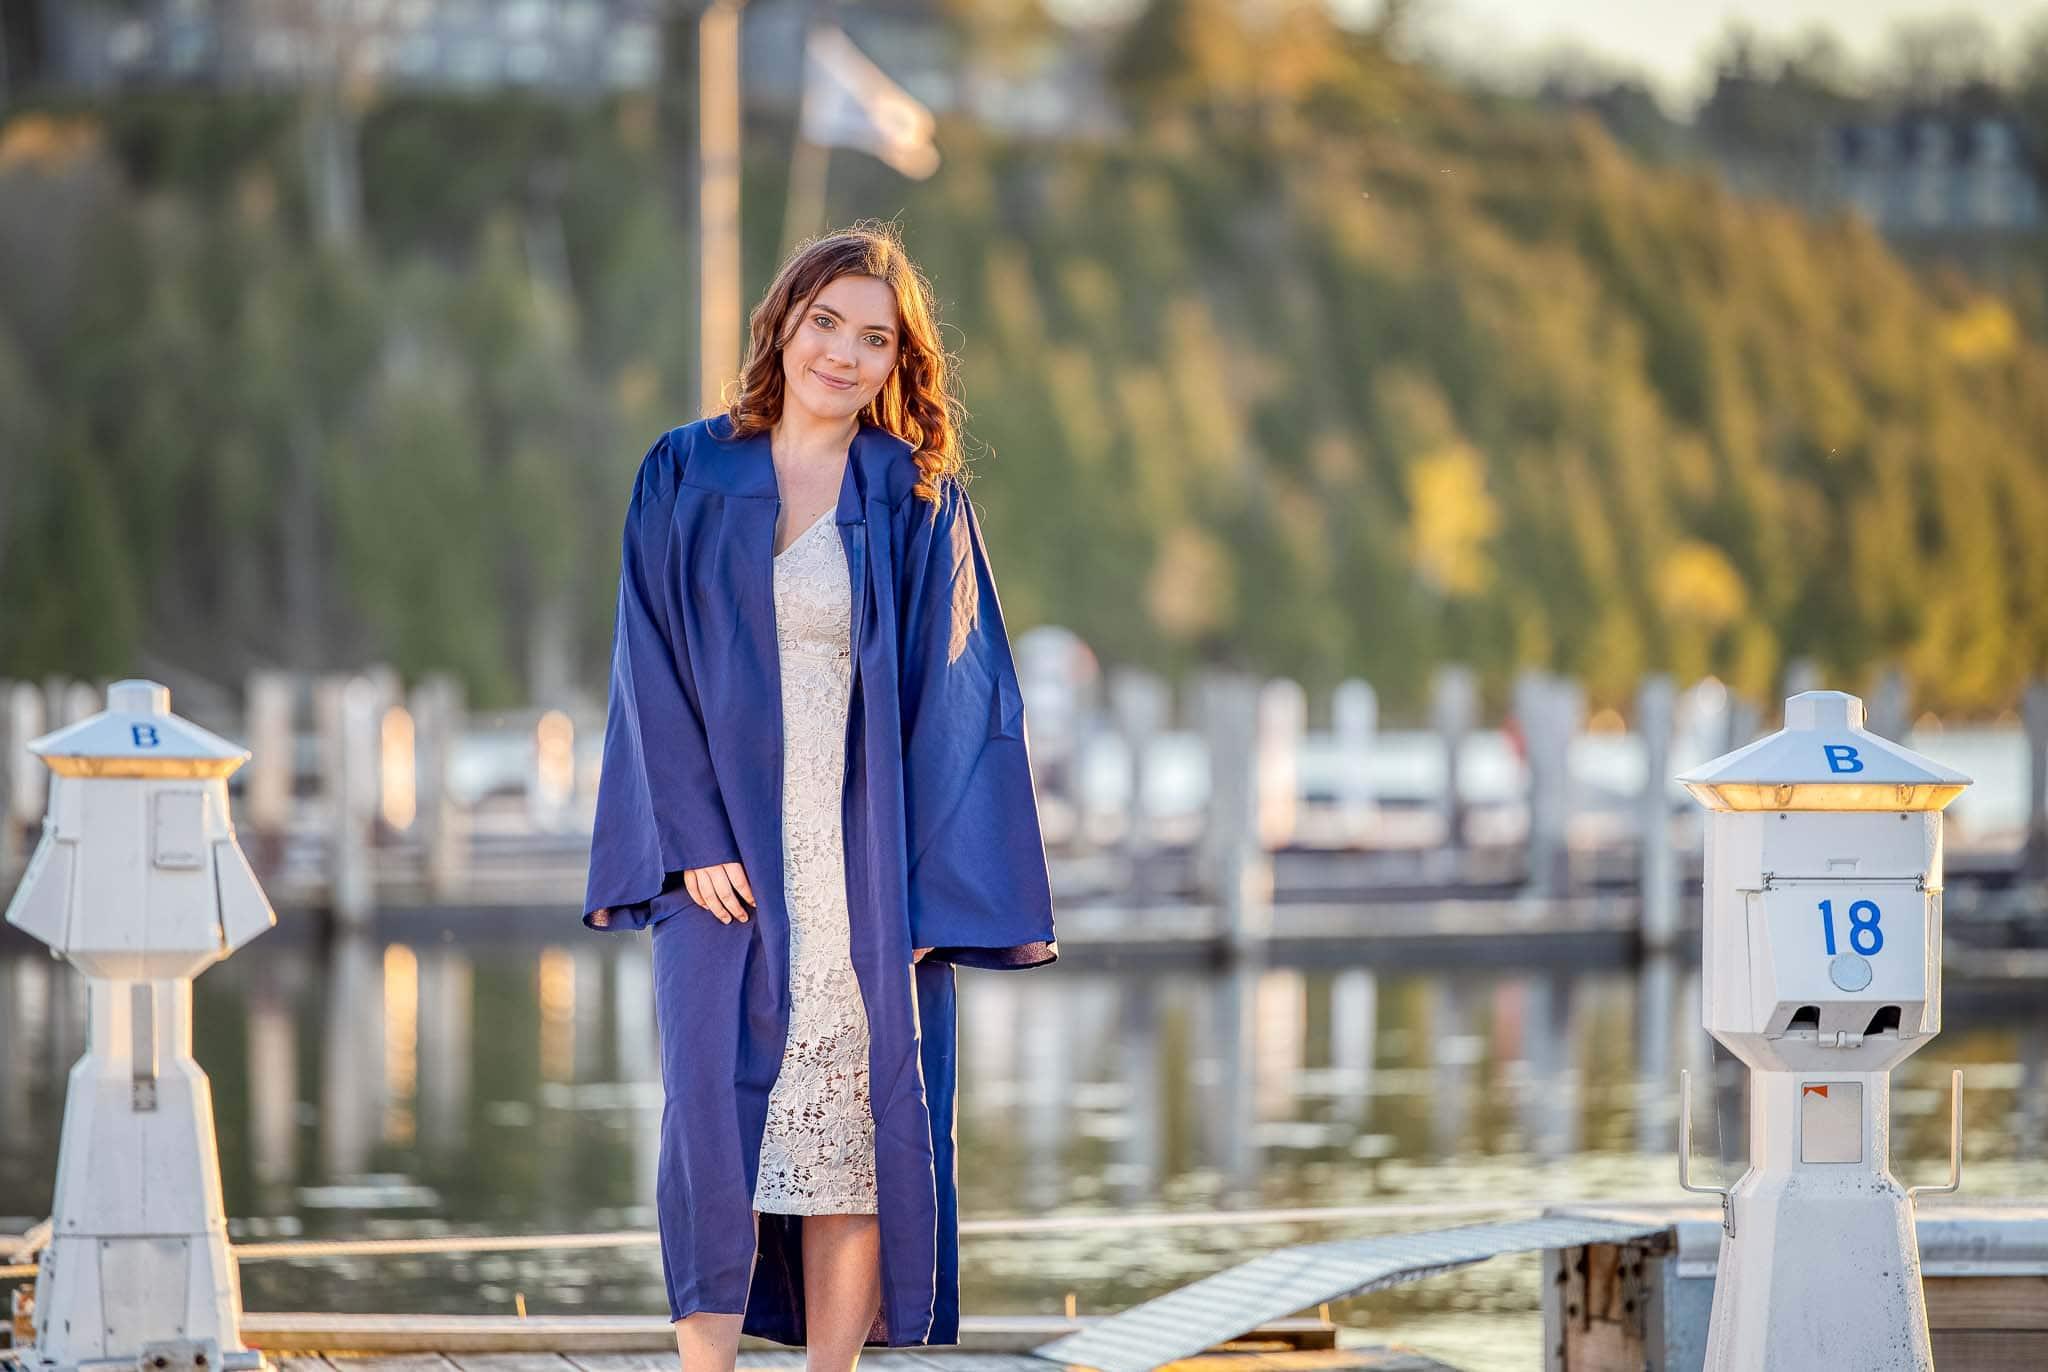 Sister Bay Graduation Photo